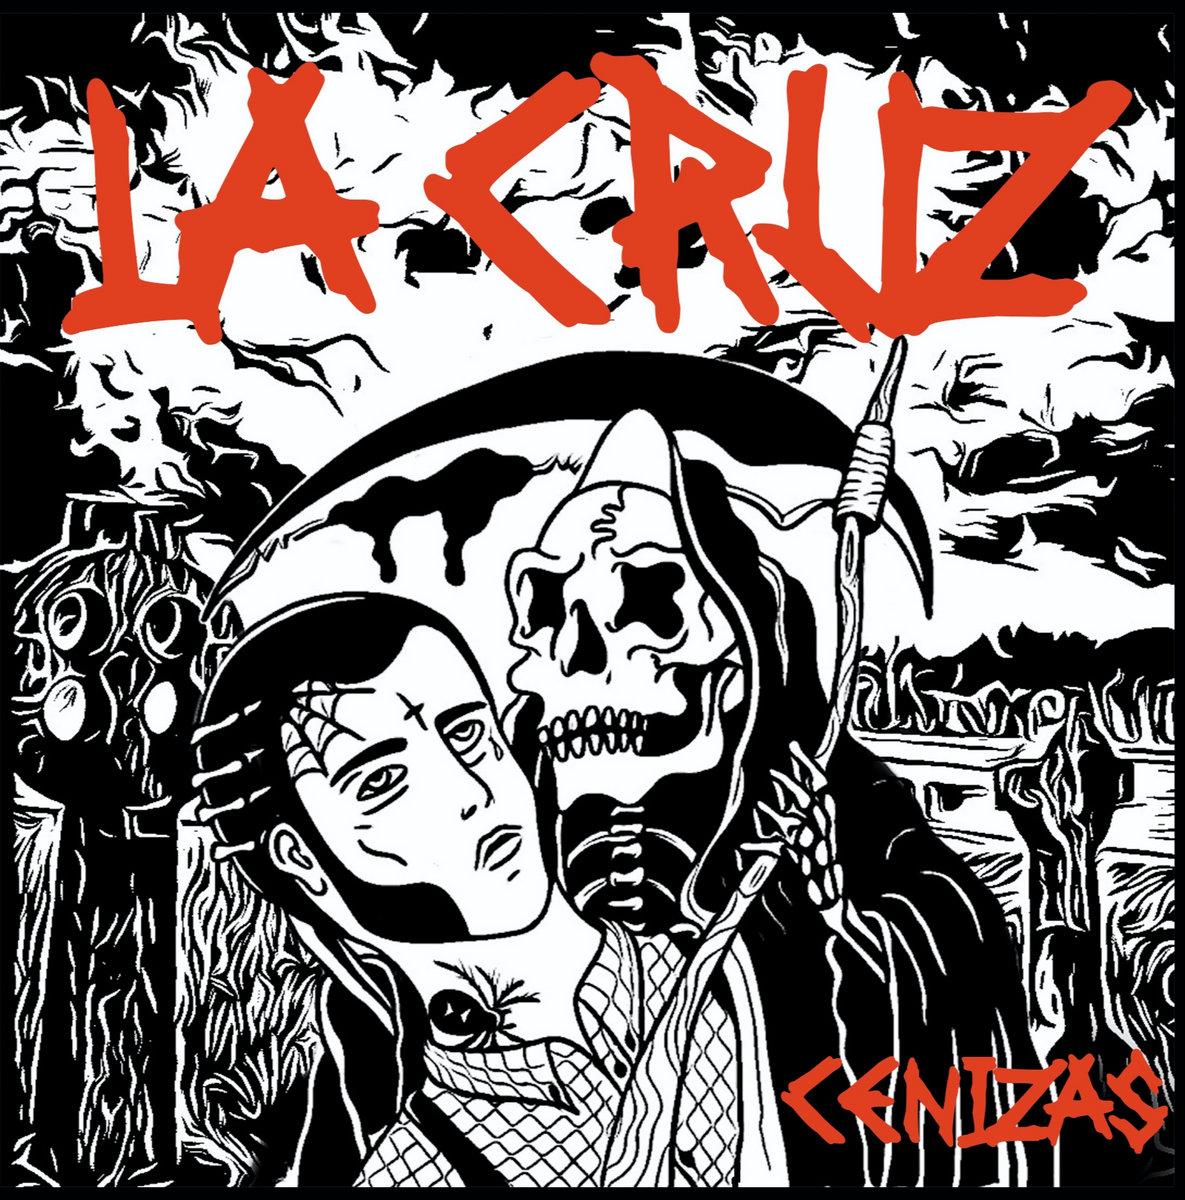 portada del album Cenizas